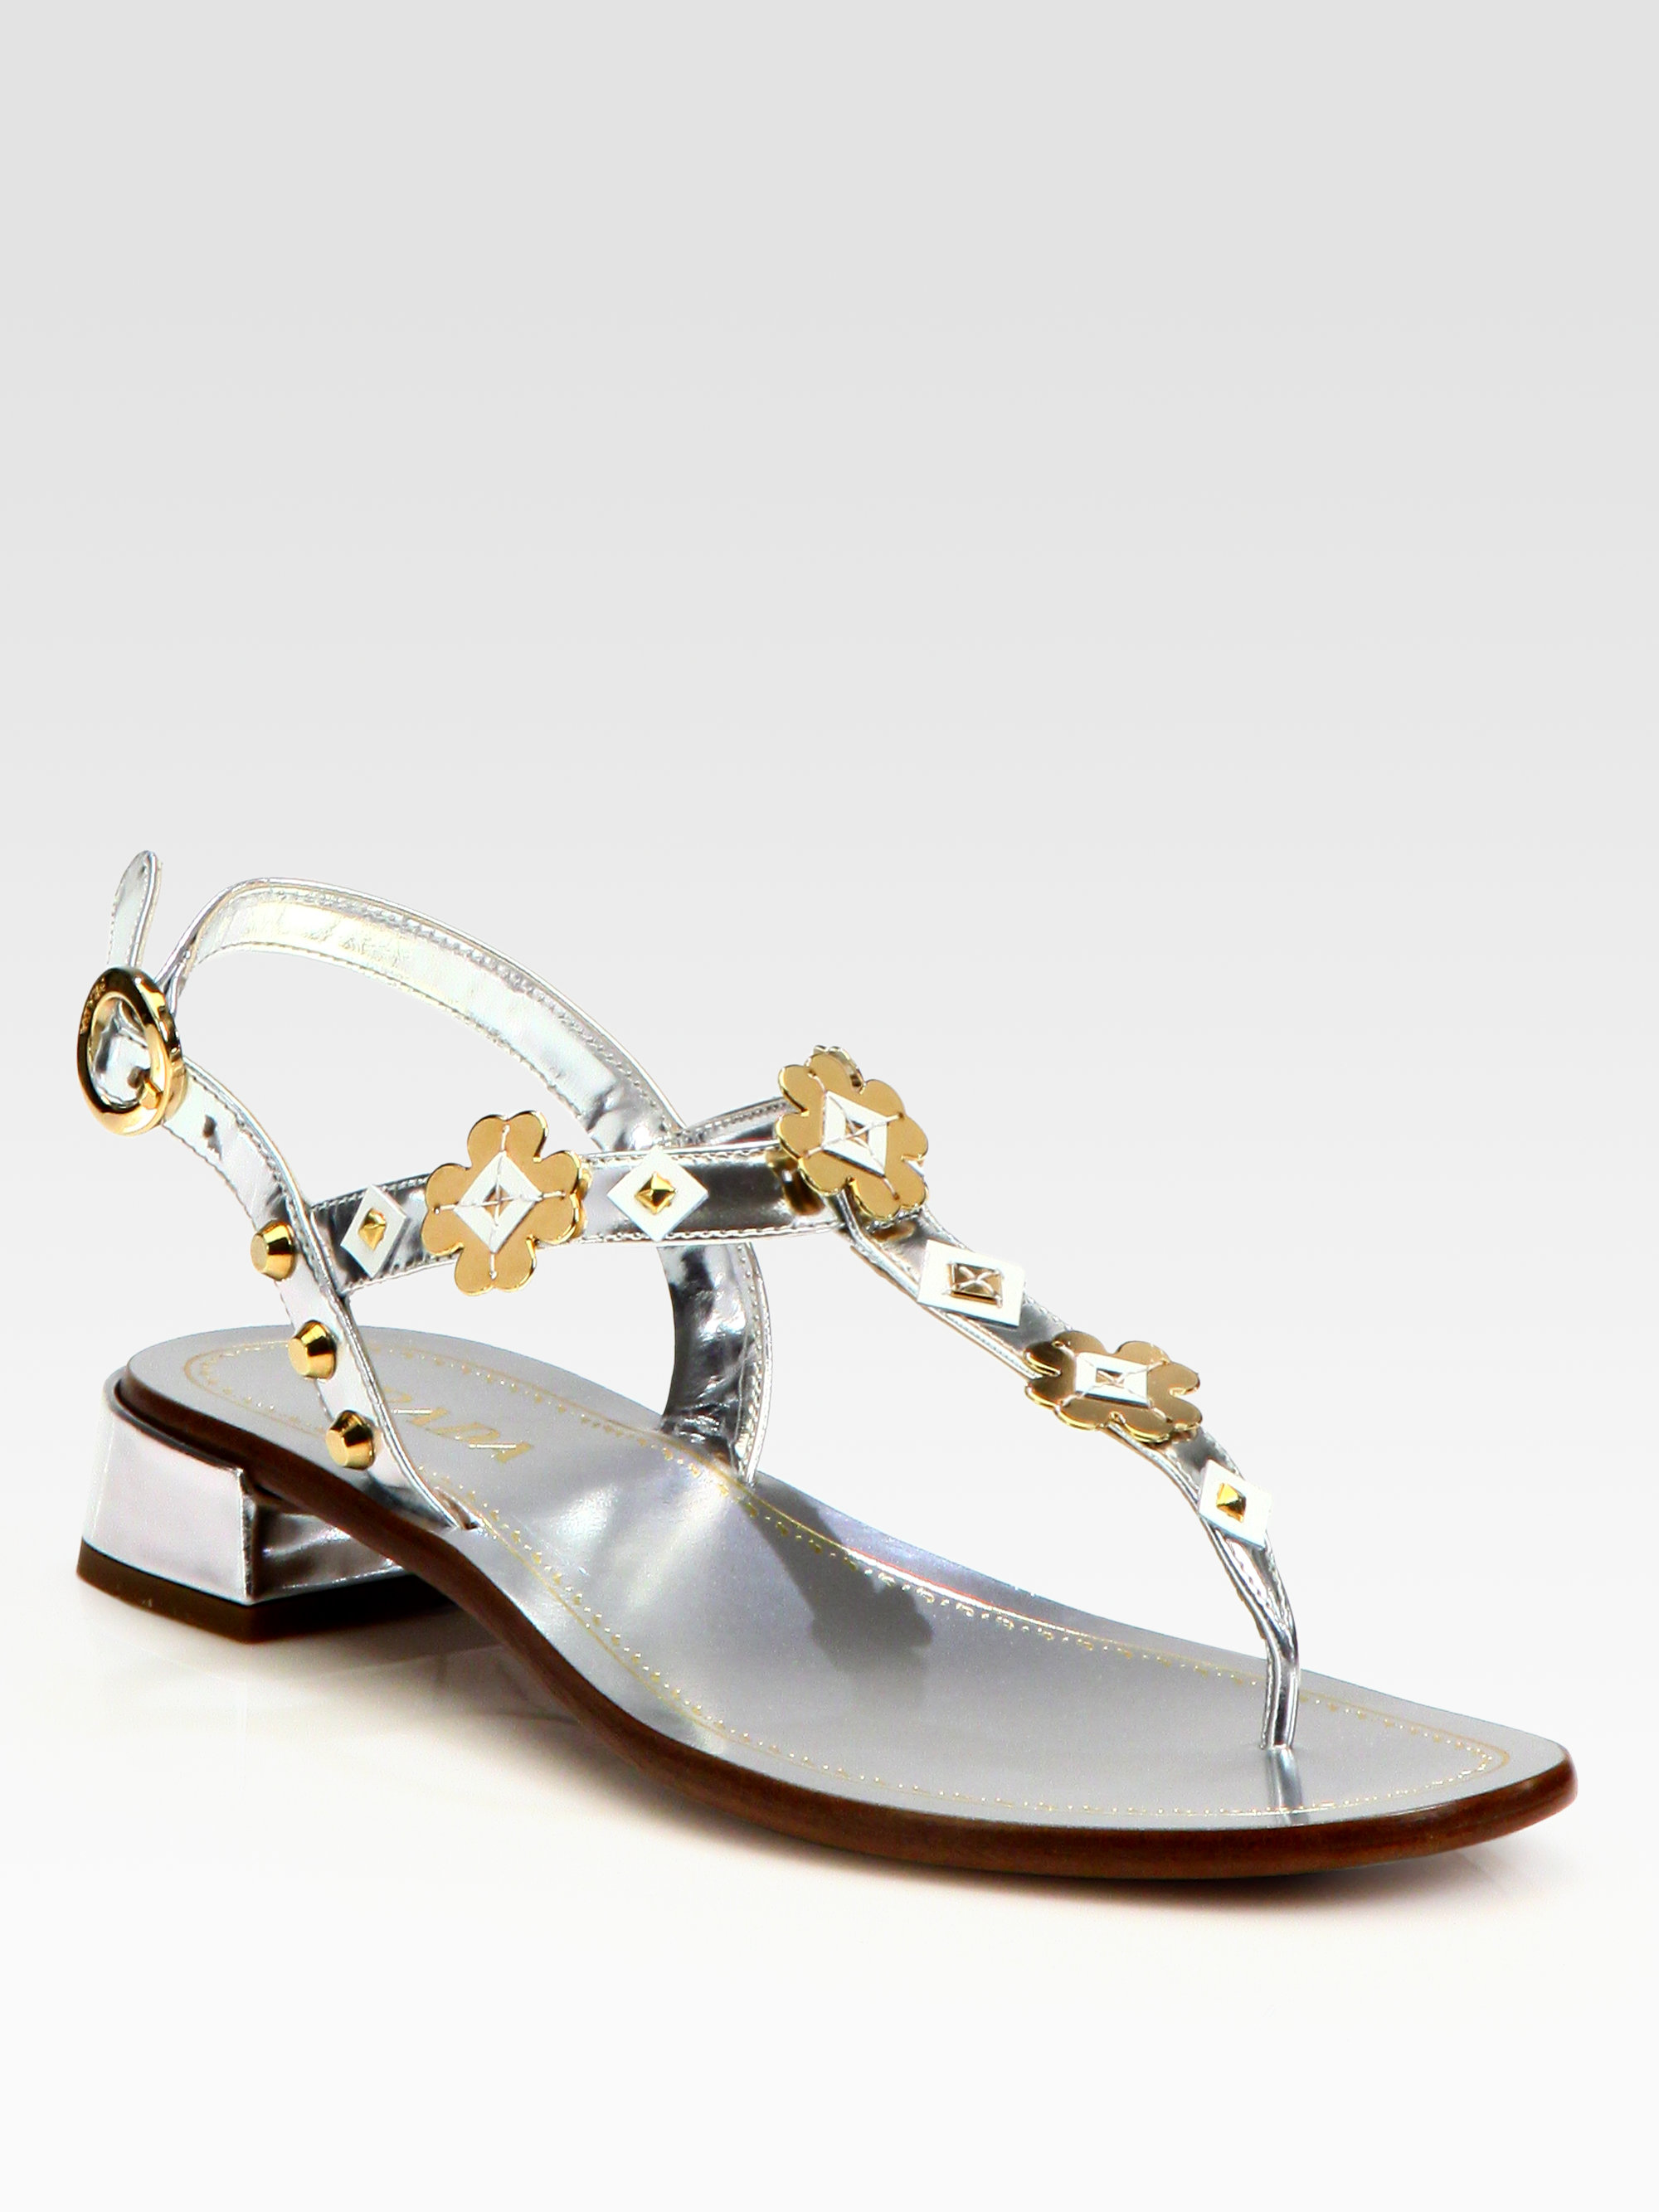 5d988ccdb937 Lyst - Prada Metallic Leather Flower Appliqu233 Thong Sandals in ...